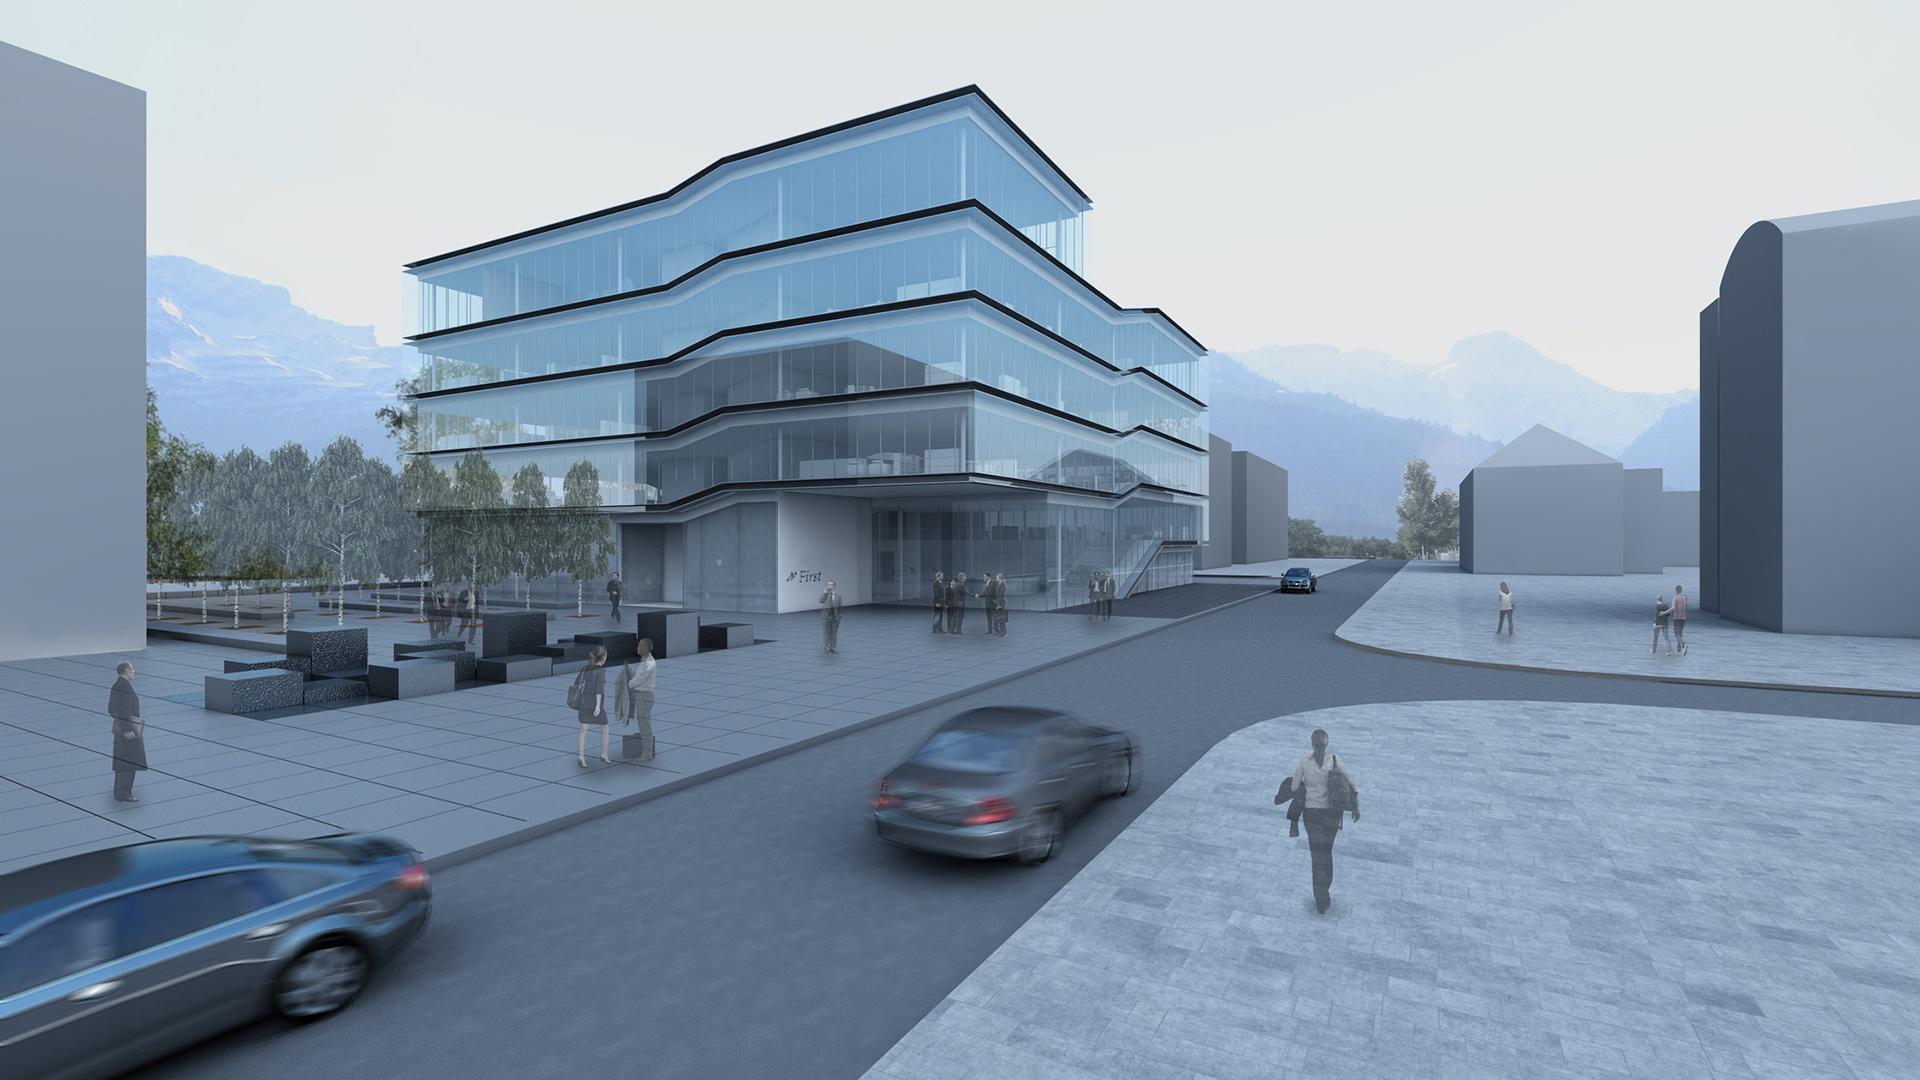 003-first-office-building-buero-philipp-moeller.jpg